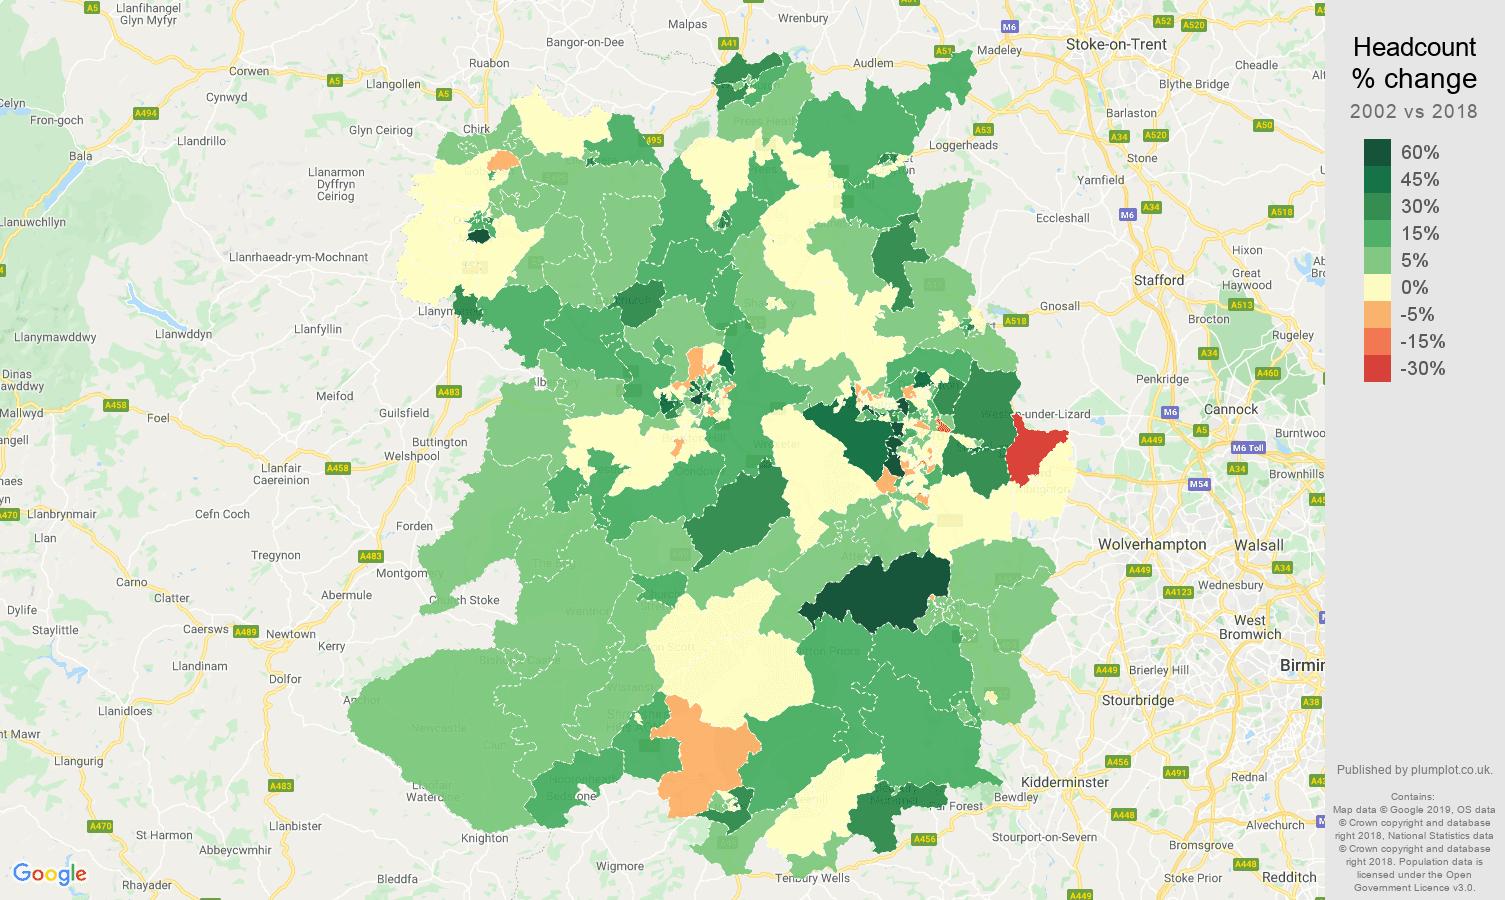 Shropshire headcount change map